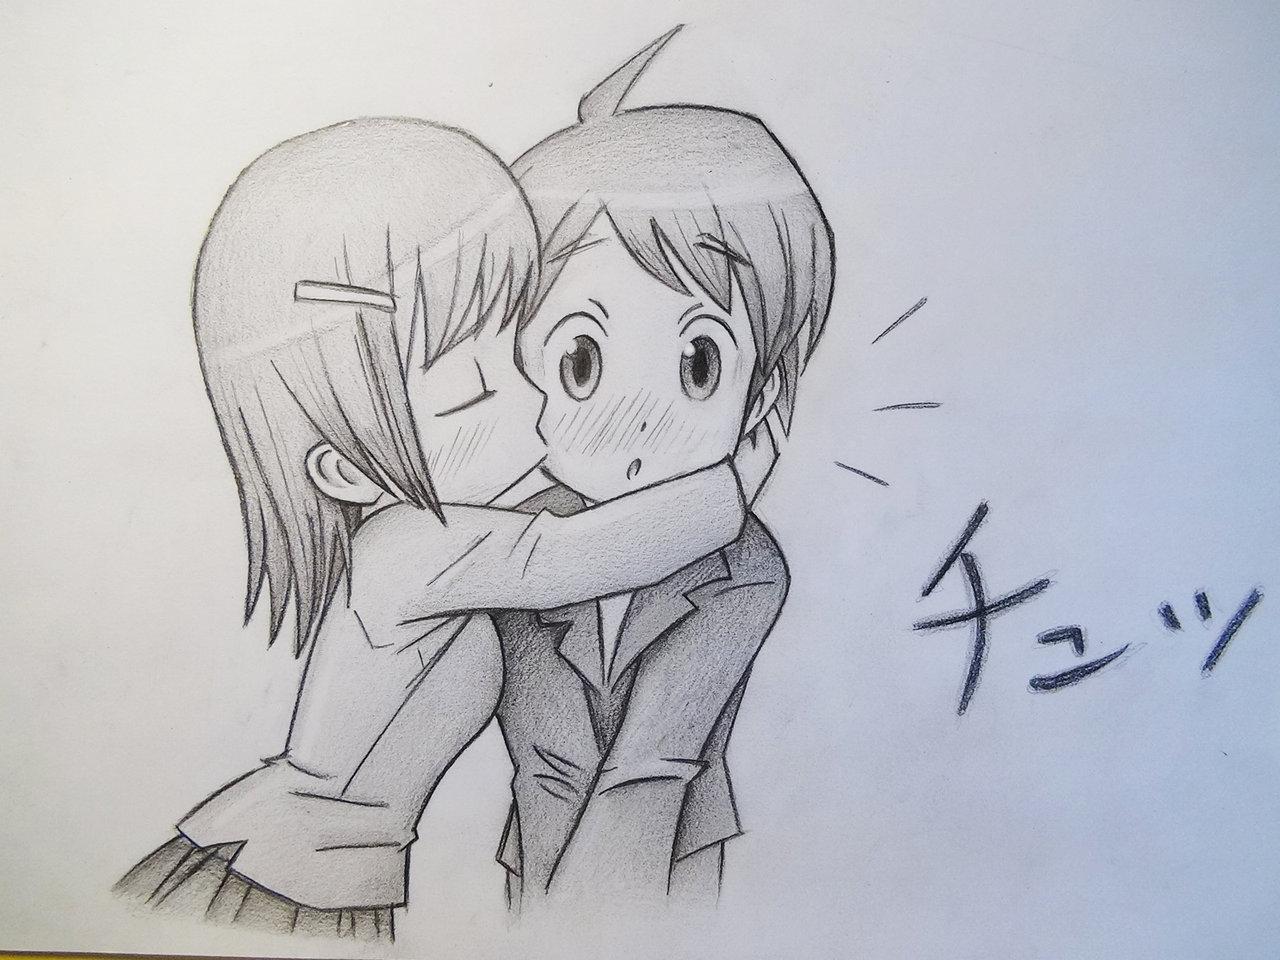 1280x960 Boy Girl Kissing Drawing Boy Girl Kissing Drawing Girl